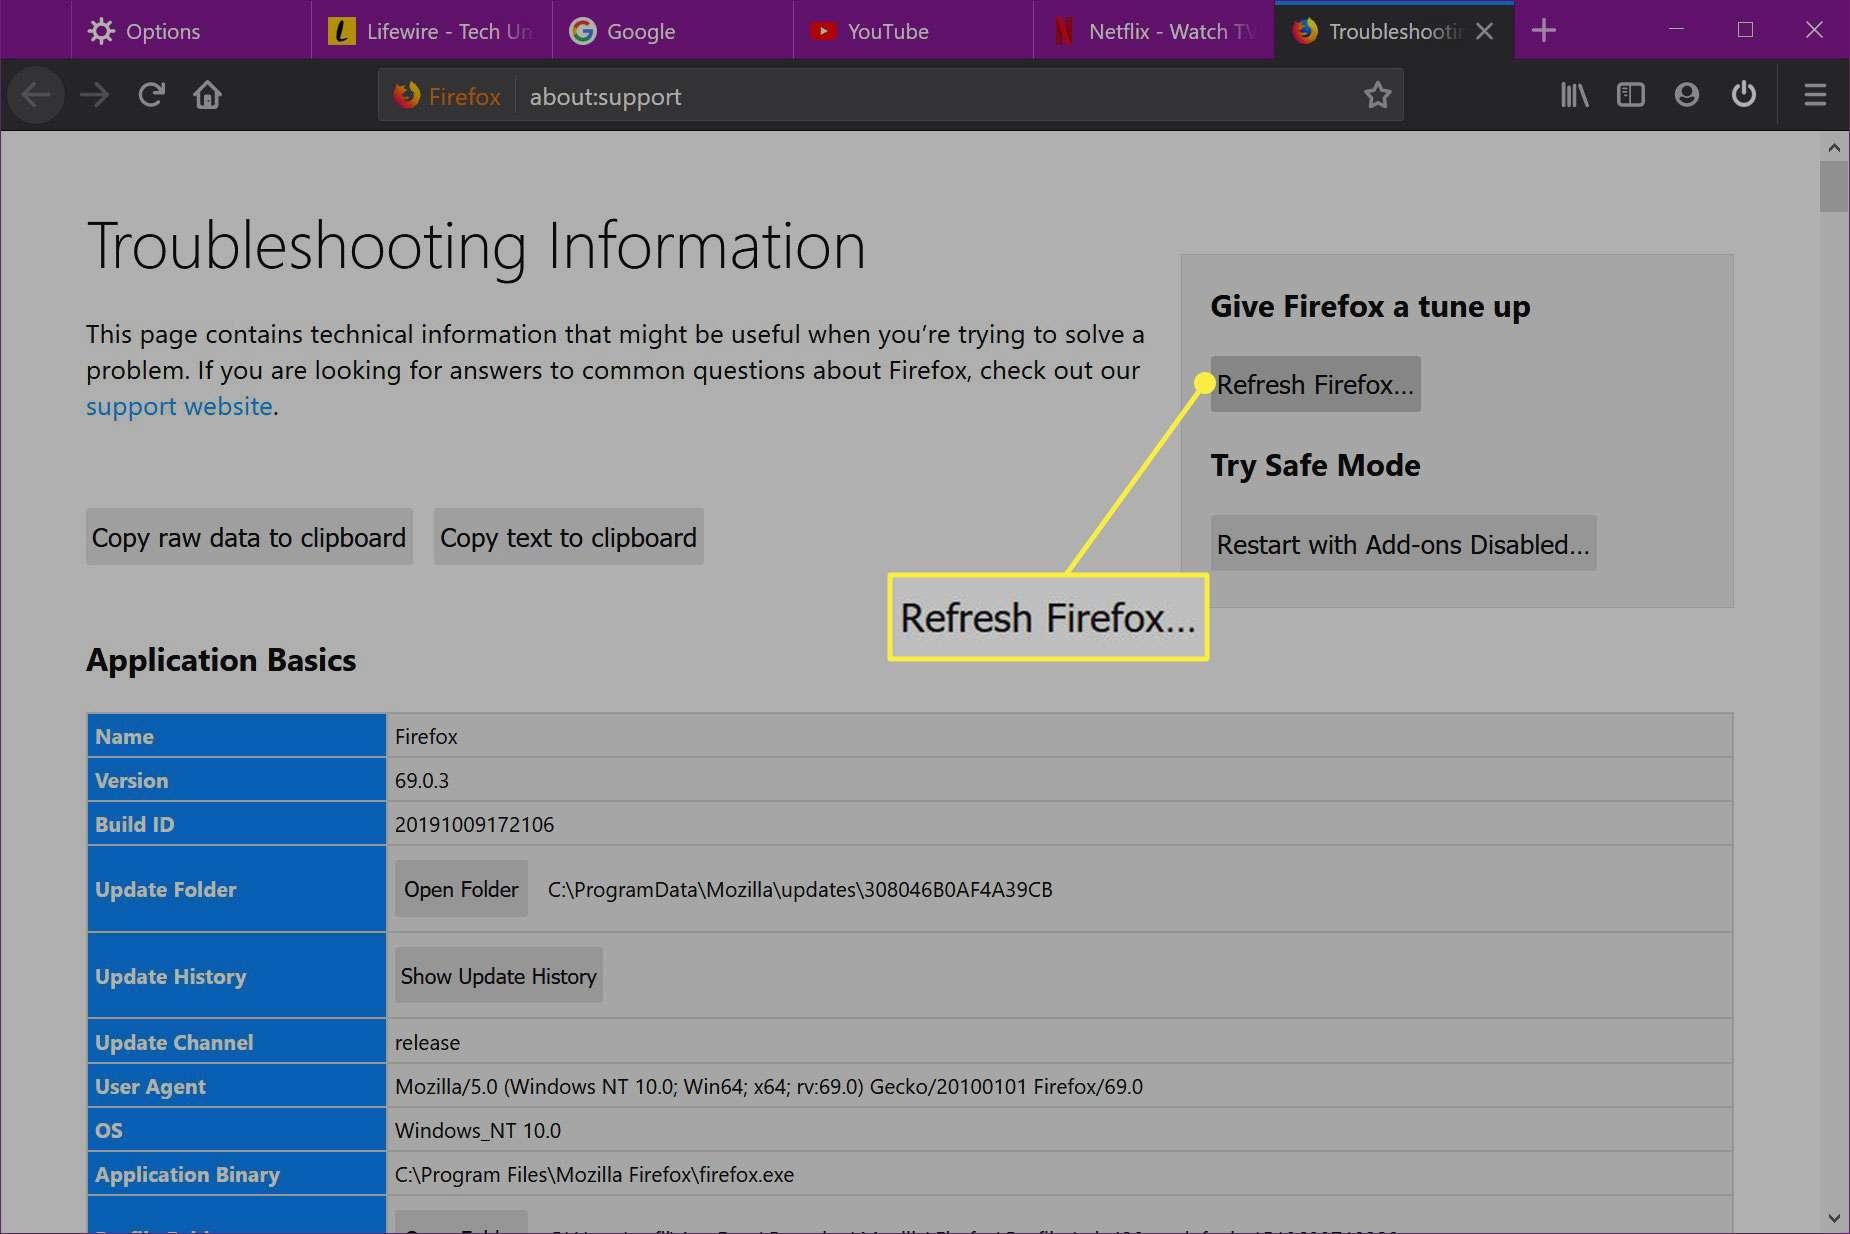 The Refresh Firefox button